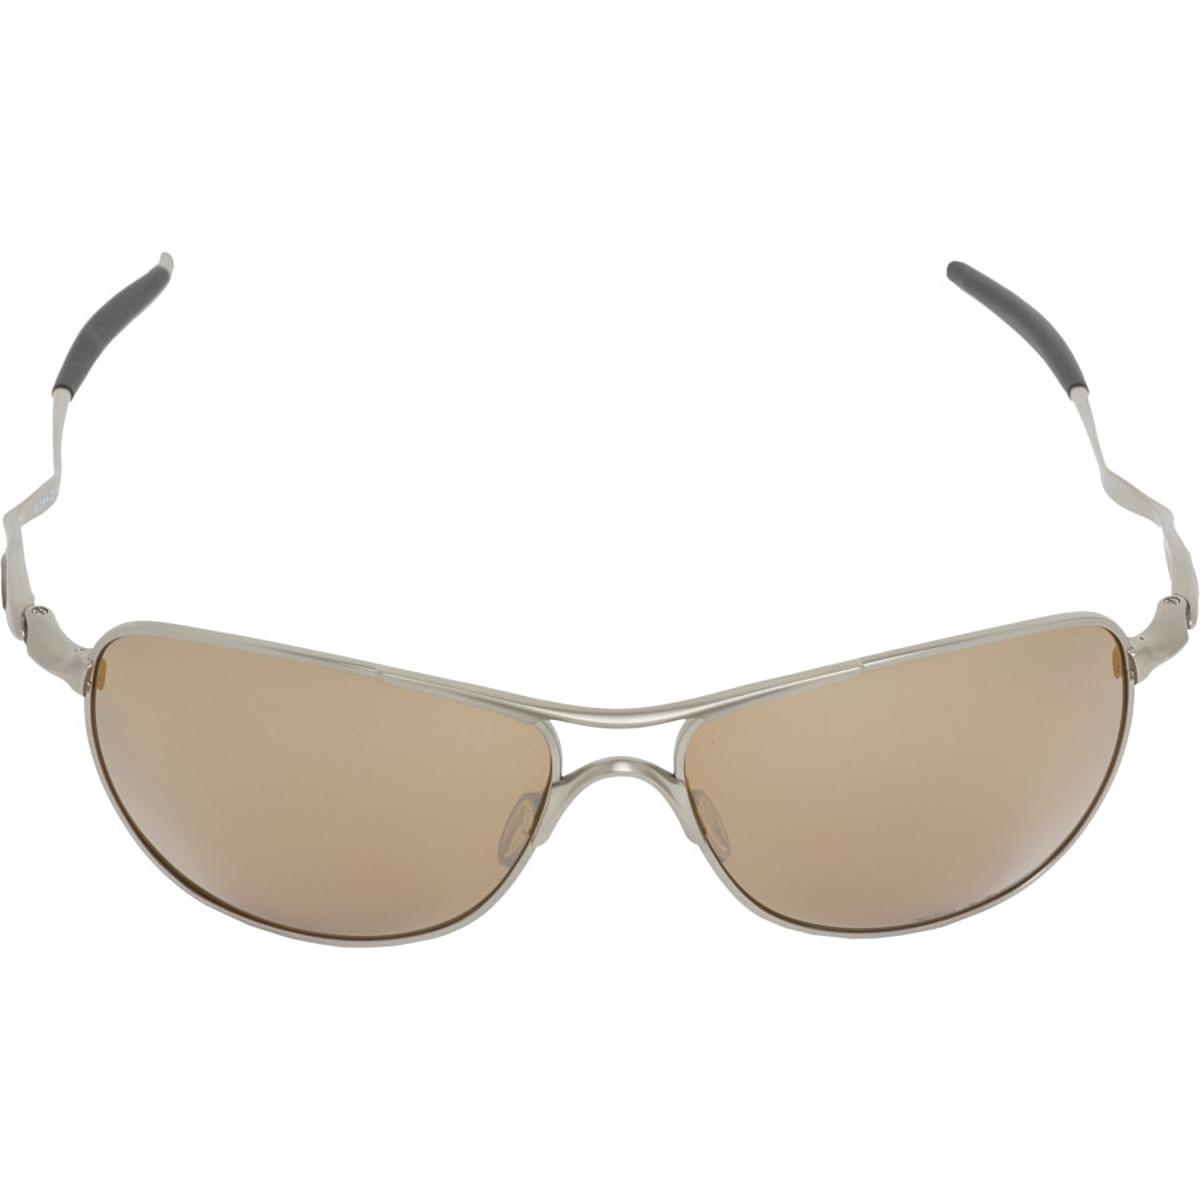 072dcc50a2 Oakley - Gray Titanium Crosshair Sunglasses - Polarized for Men - Lyst.  View fullscreen